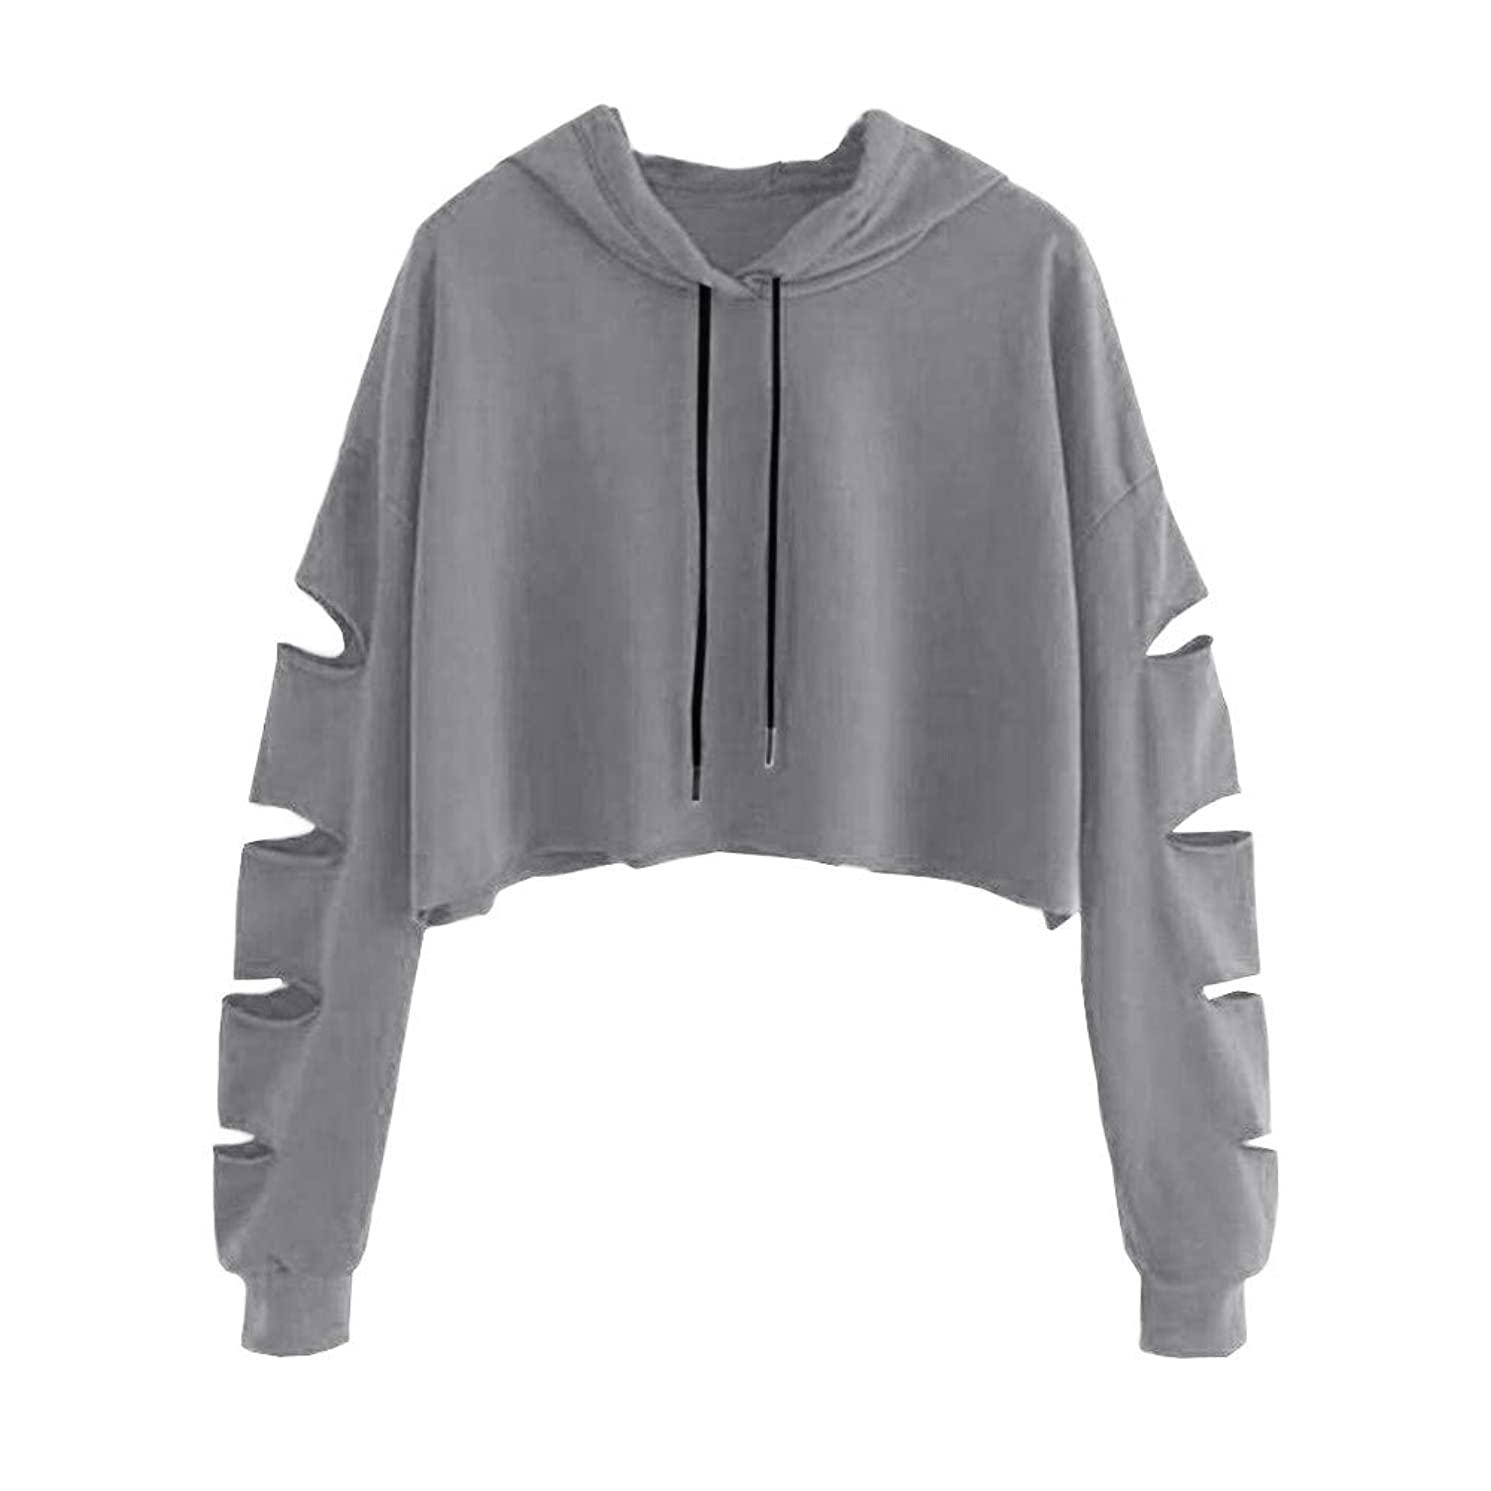 Women Hoodie Long Sleeve Pullover Teen Girls Cute Crop Tops Solid Sweatshirts Casual Hollow Jumper Blouse Shirts